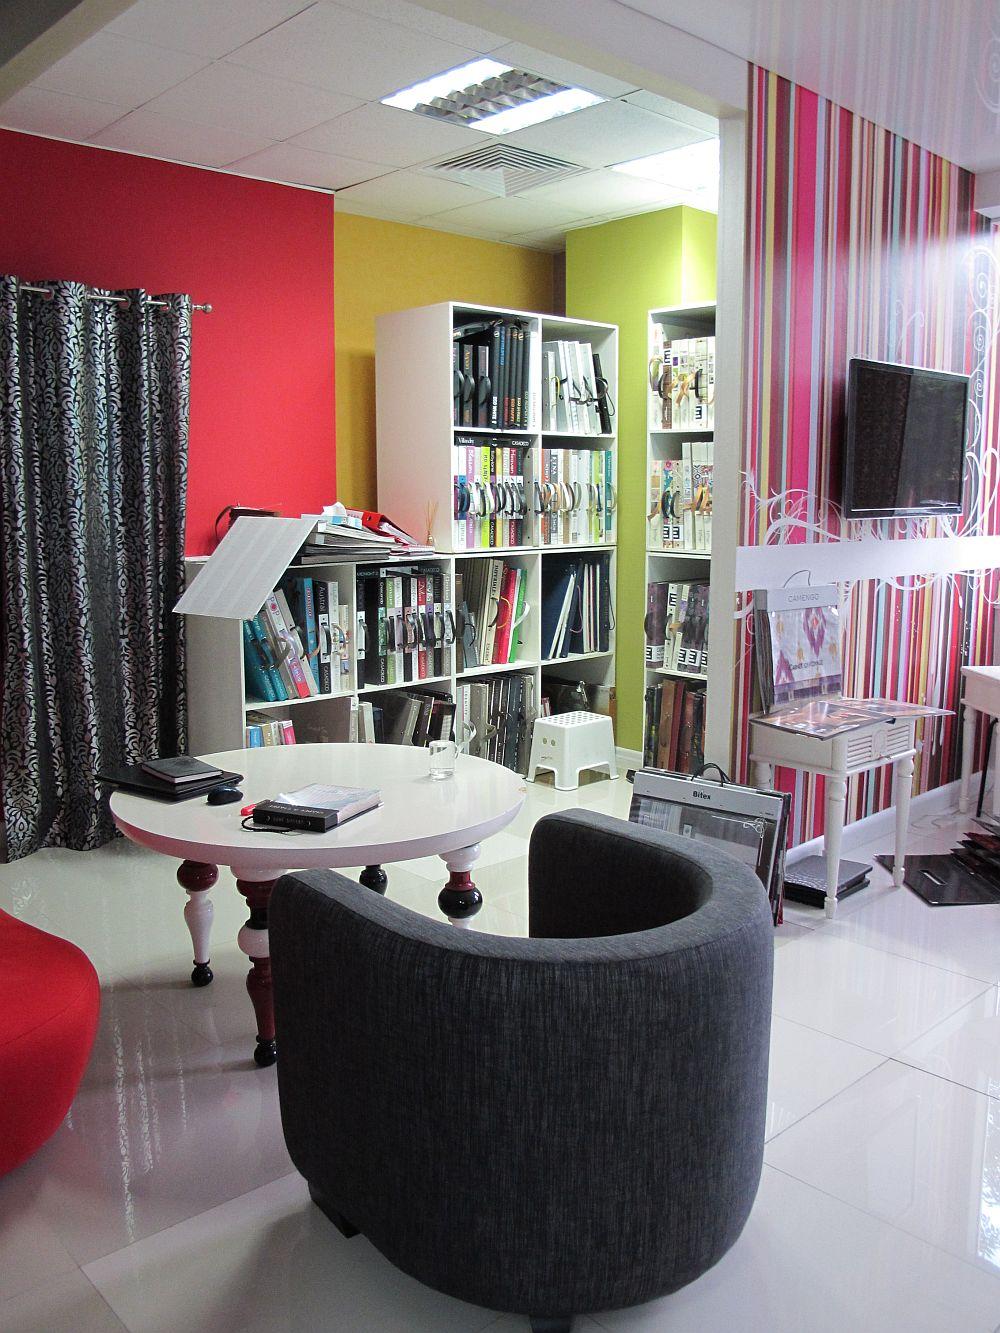 adelaparvu.com despre decoratiuni ProPlus, tapete, perdele, draperii, corpuri iluminat, oglinzi, mobila, parchet (8)